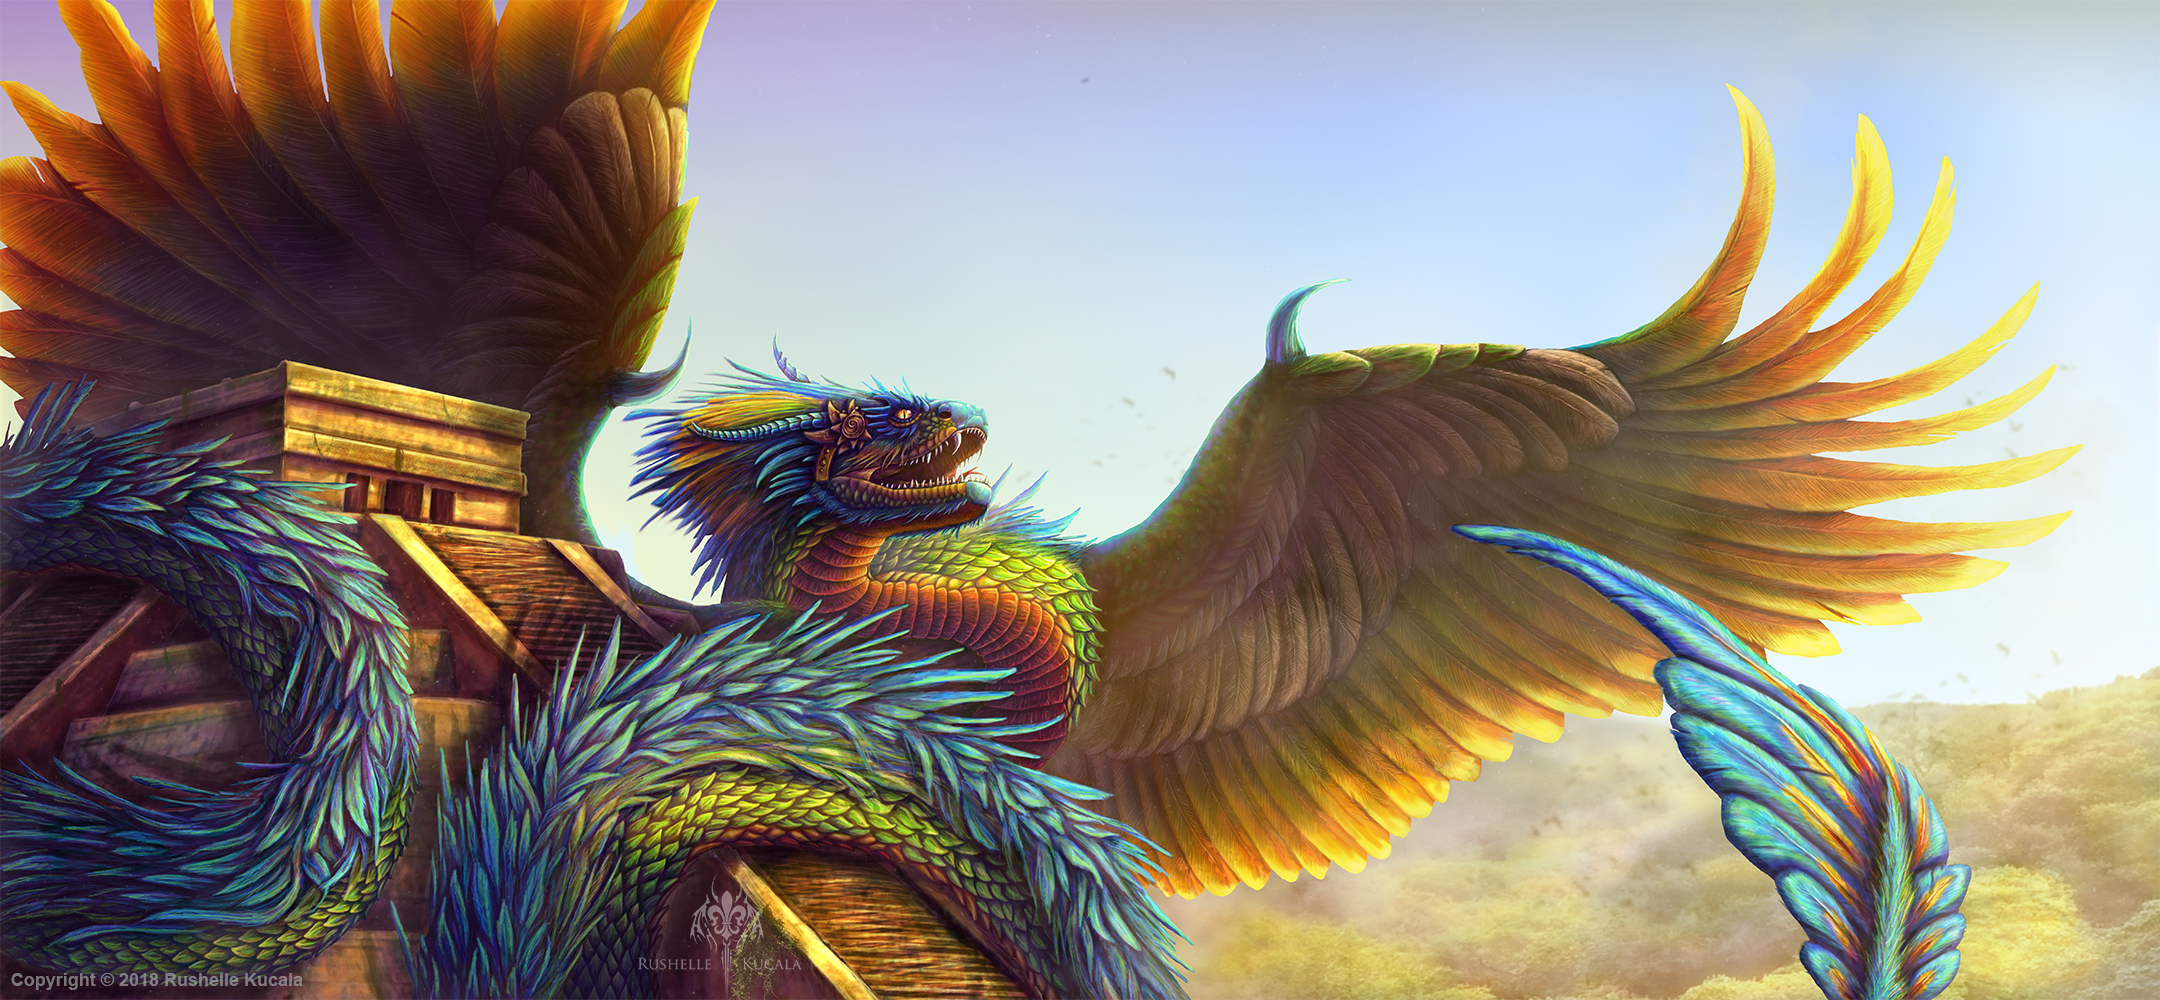 potenza Quetzalcoatl, il Serpente Piumato - by TheDragonofDoom DeviantArt.com © dell'autore